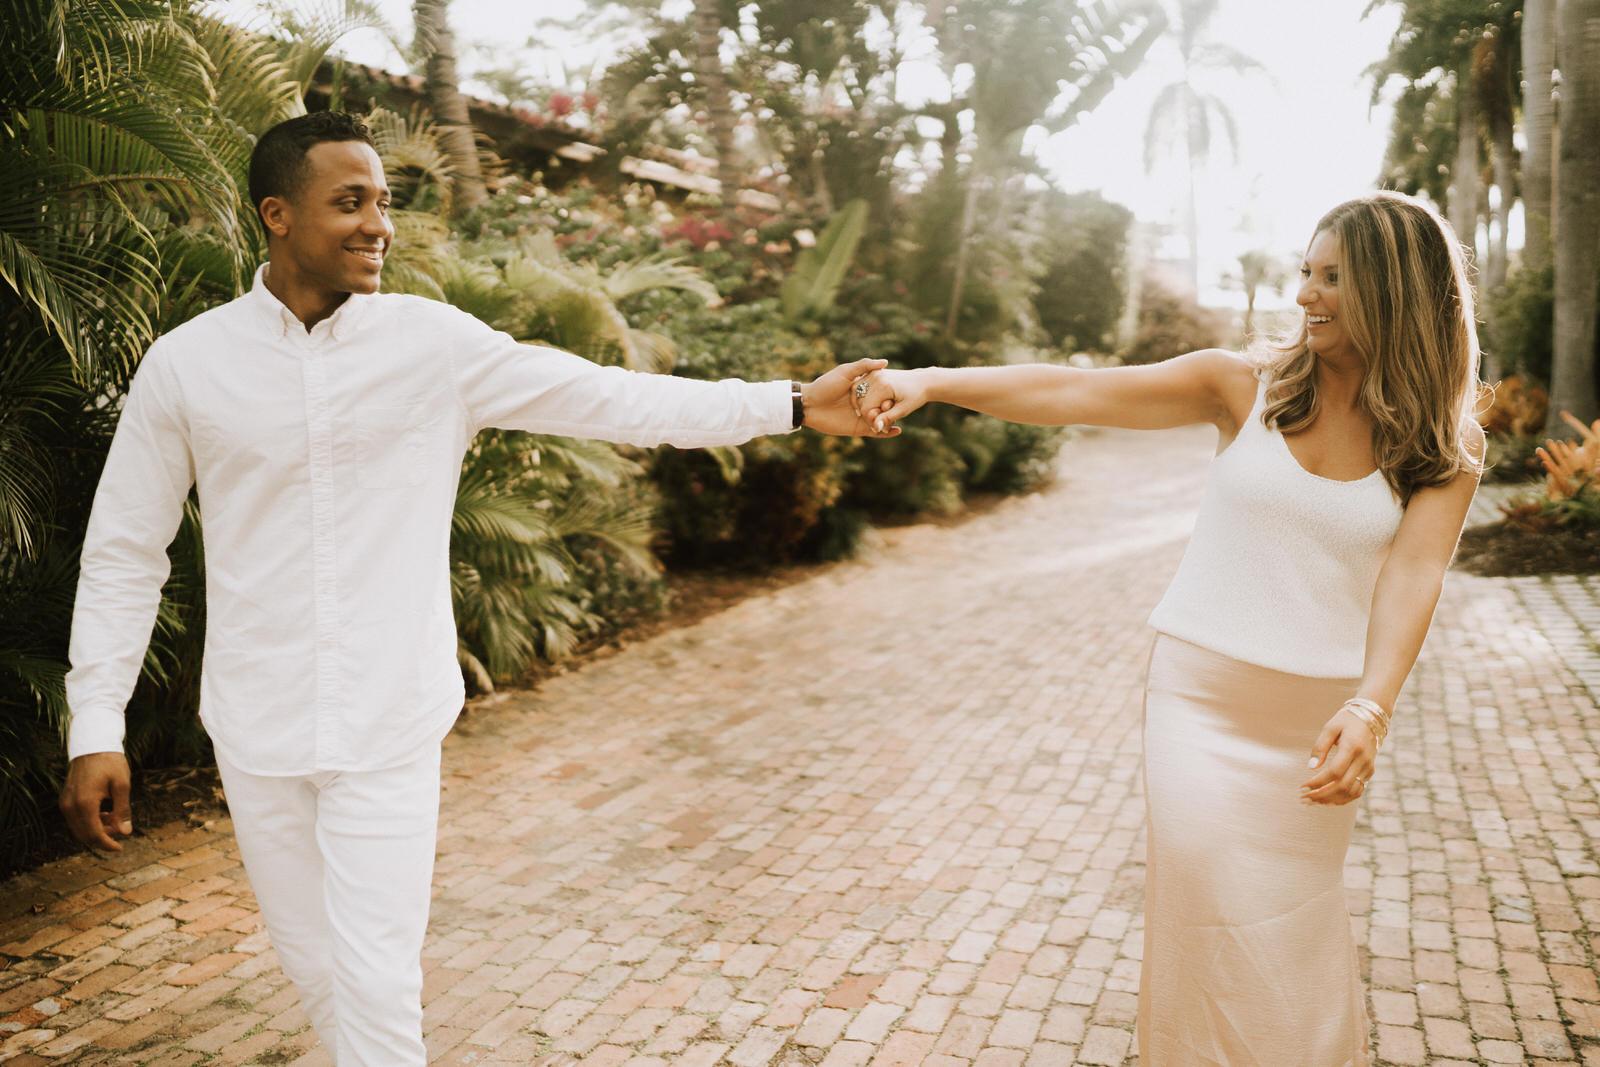 Naples 5th Ave Engagement Photos- Michelle Gonzalez Photography- Michele + Troy-39.JPG